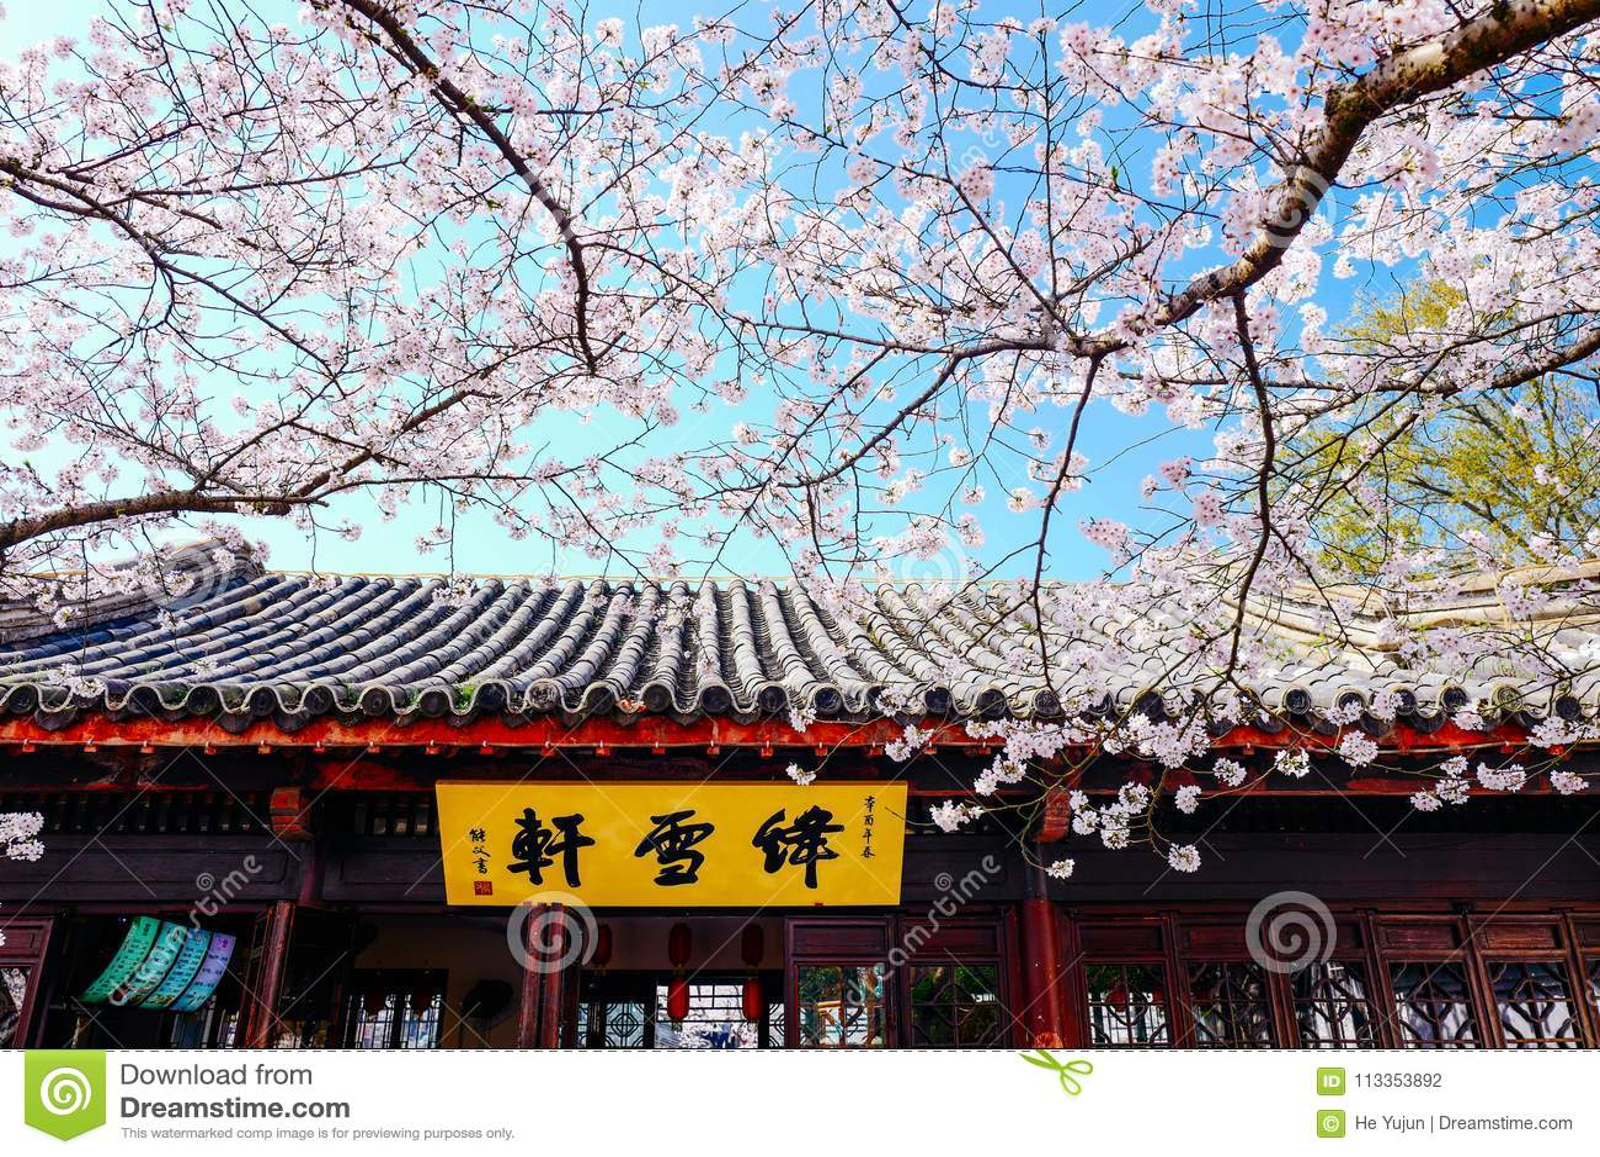 Cherry Blossom valley,wuxi,china